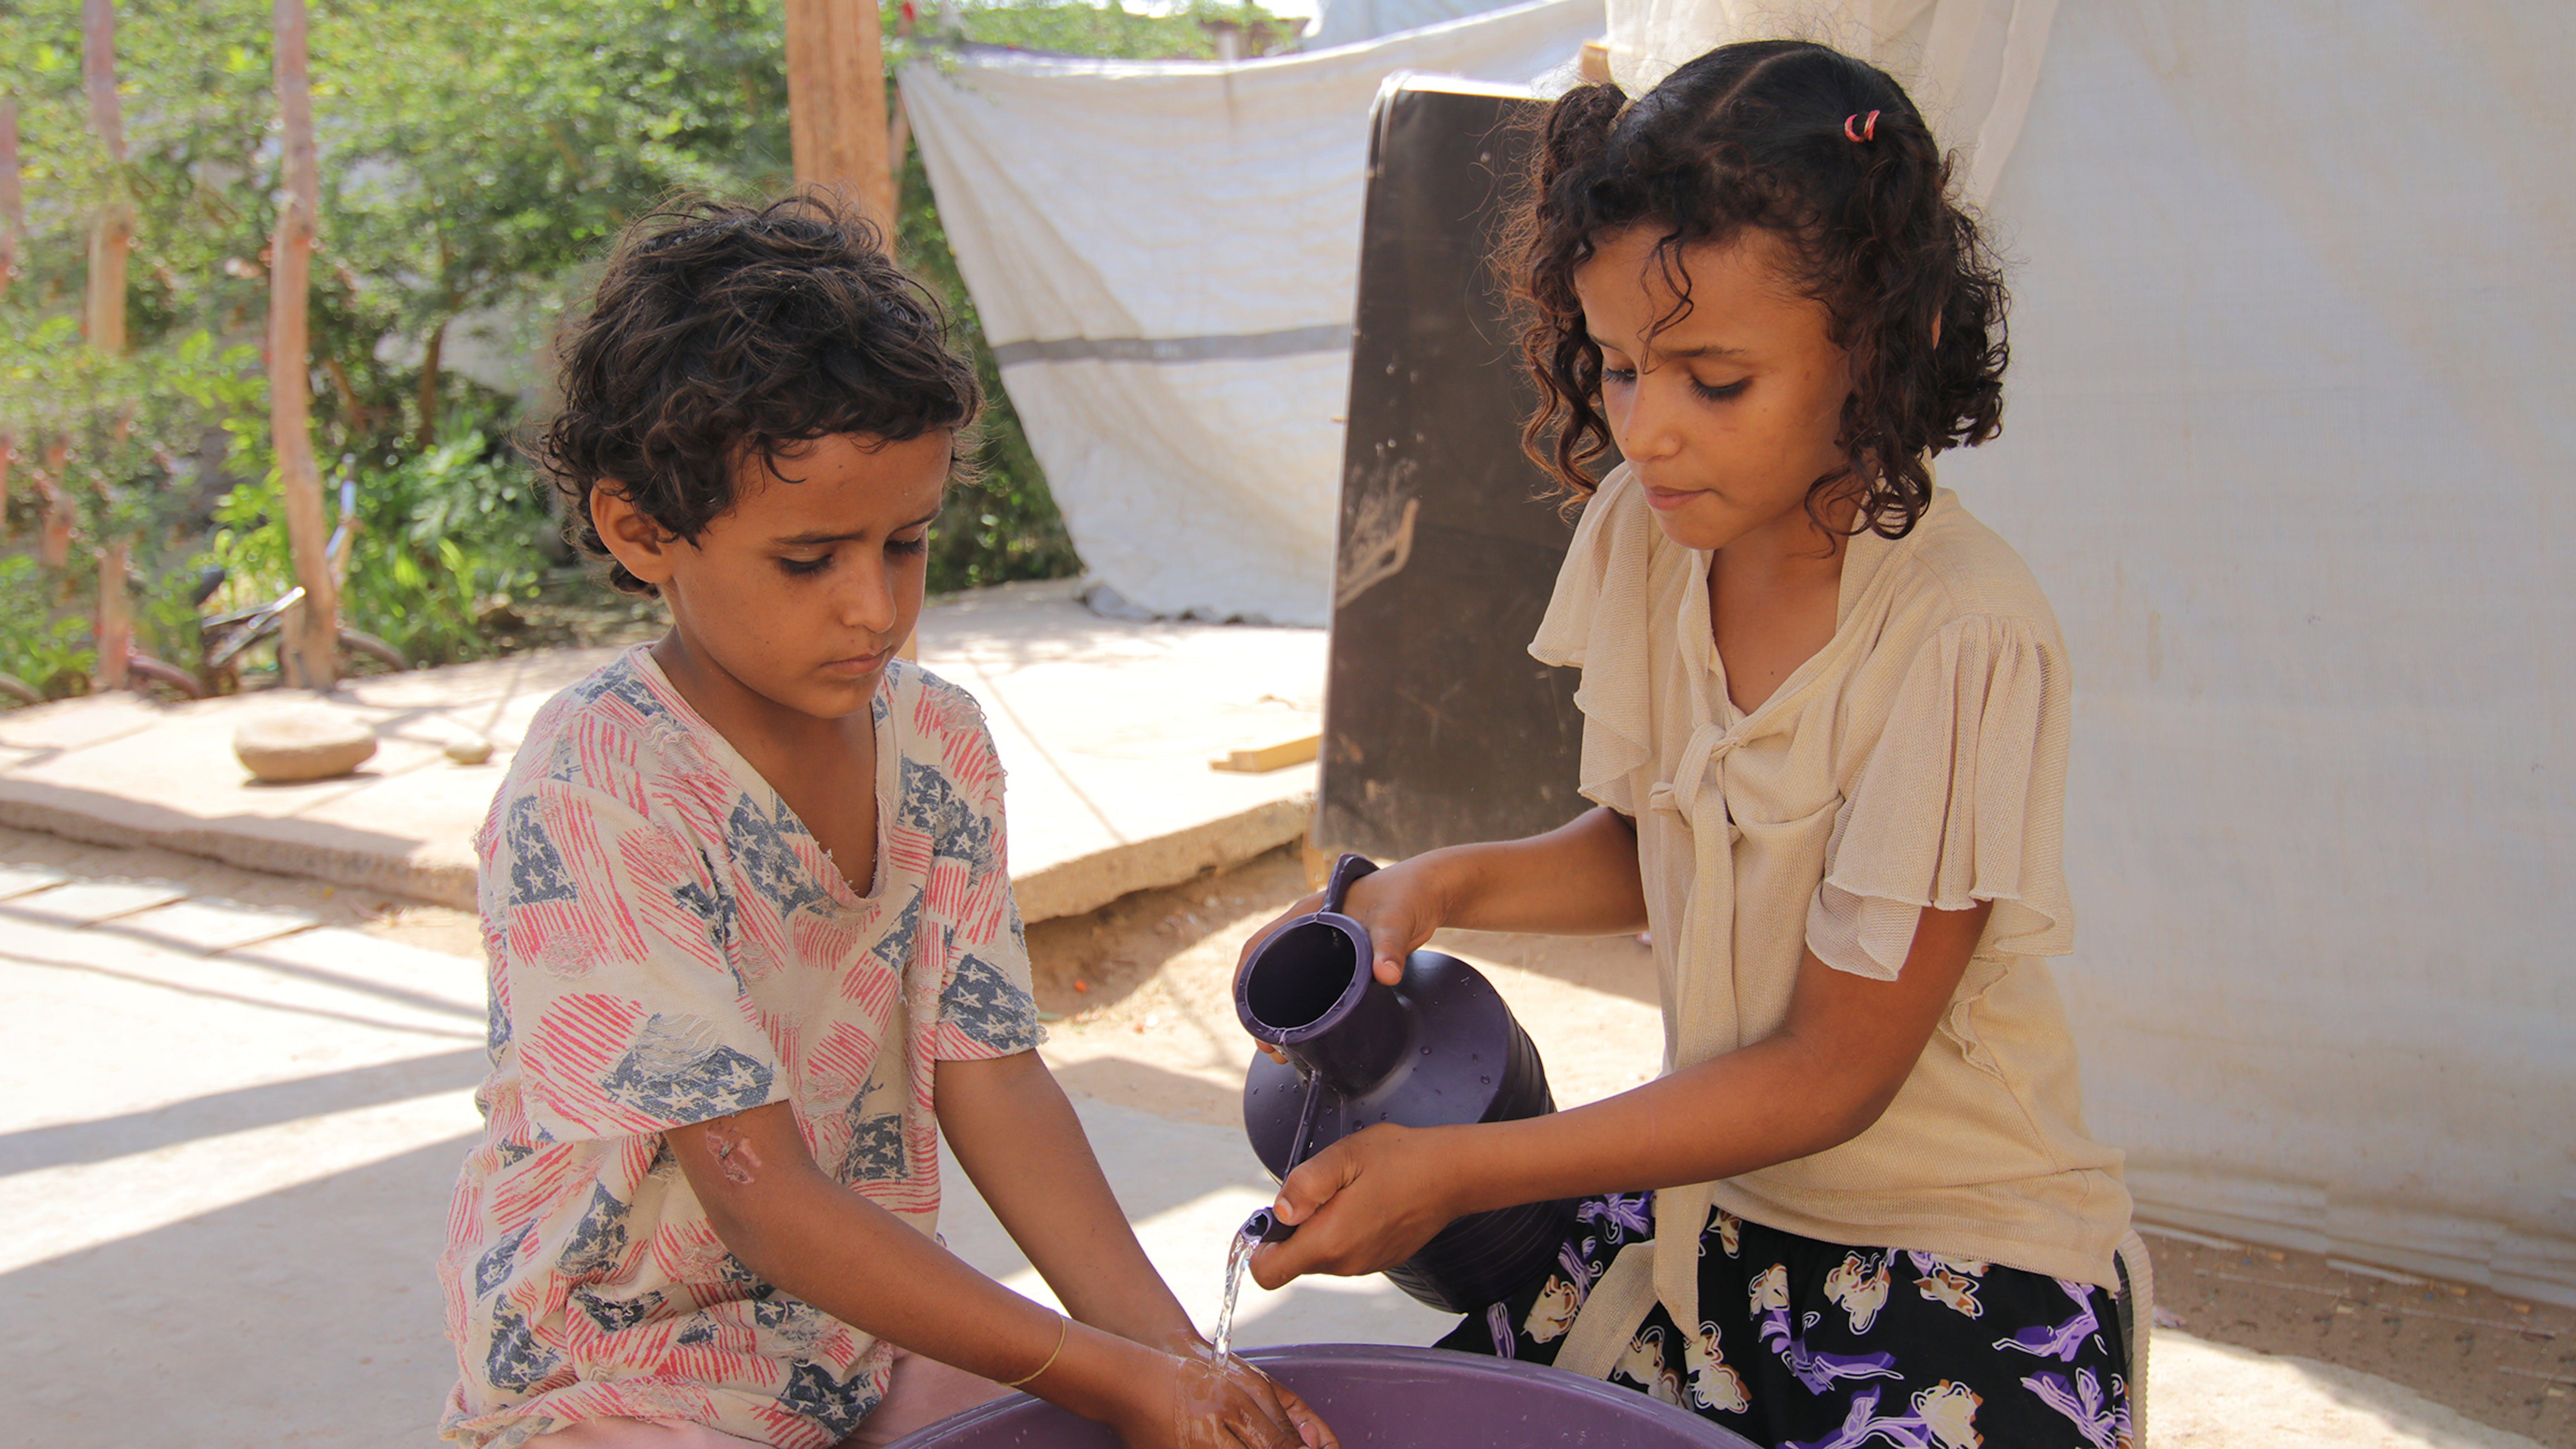 Yemen, bambini lavano le verdure prima di cucinarle